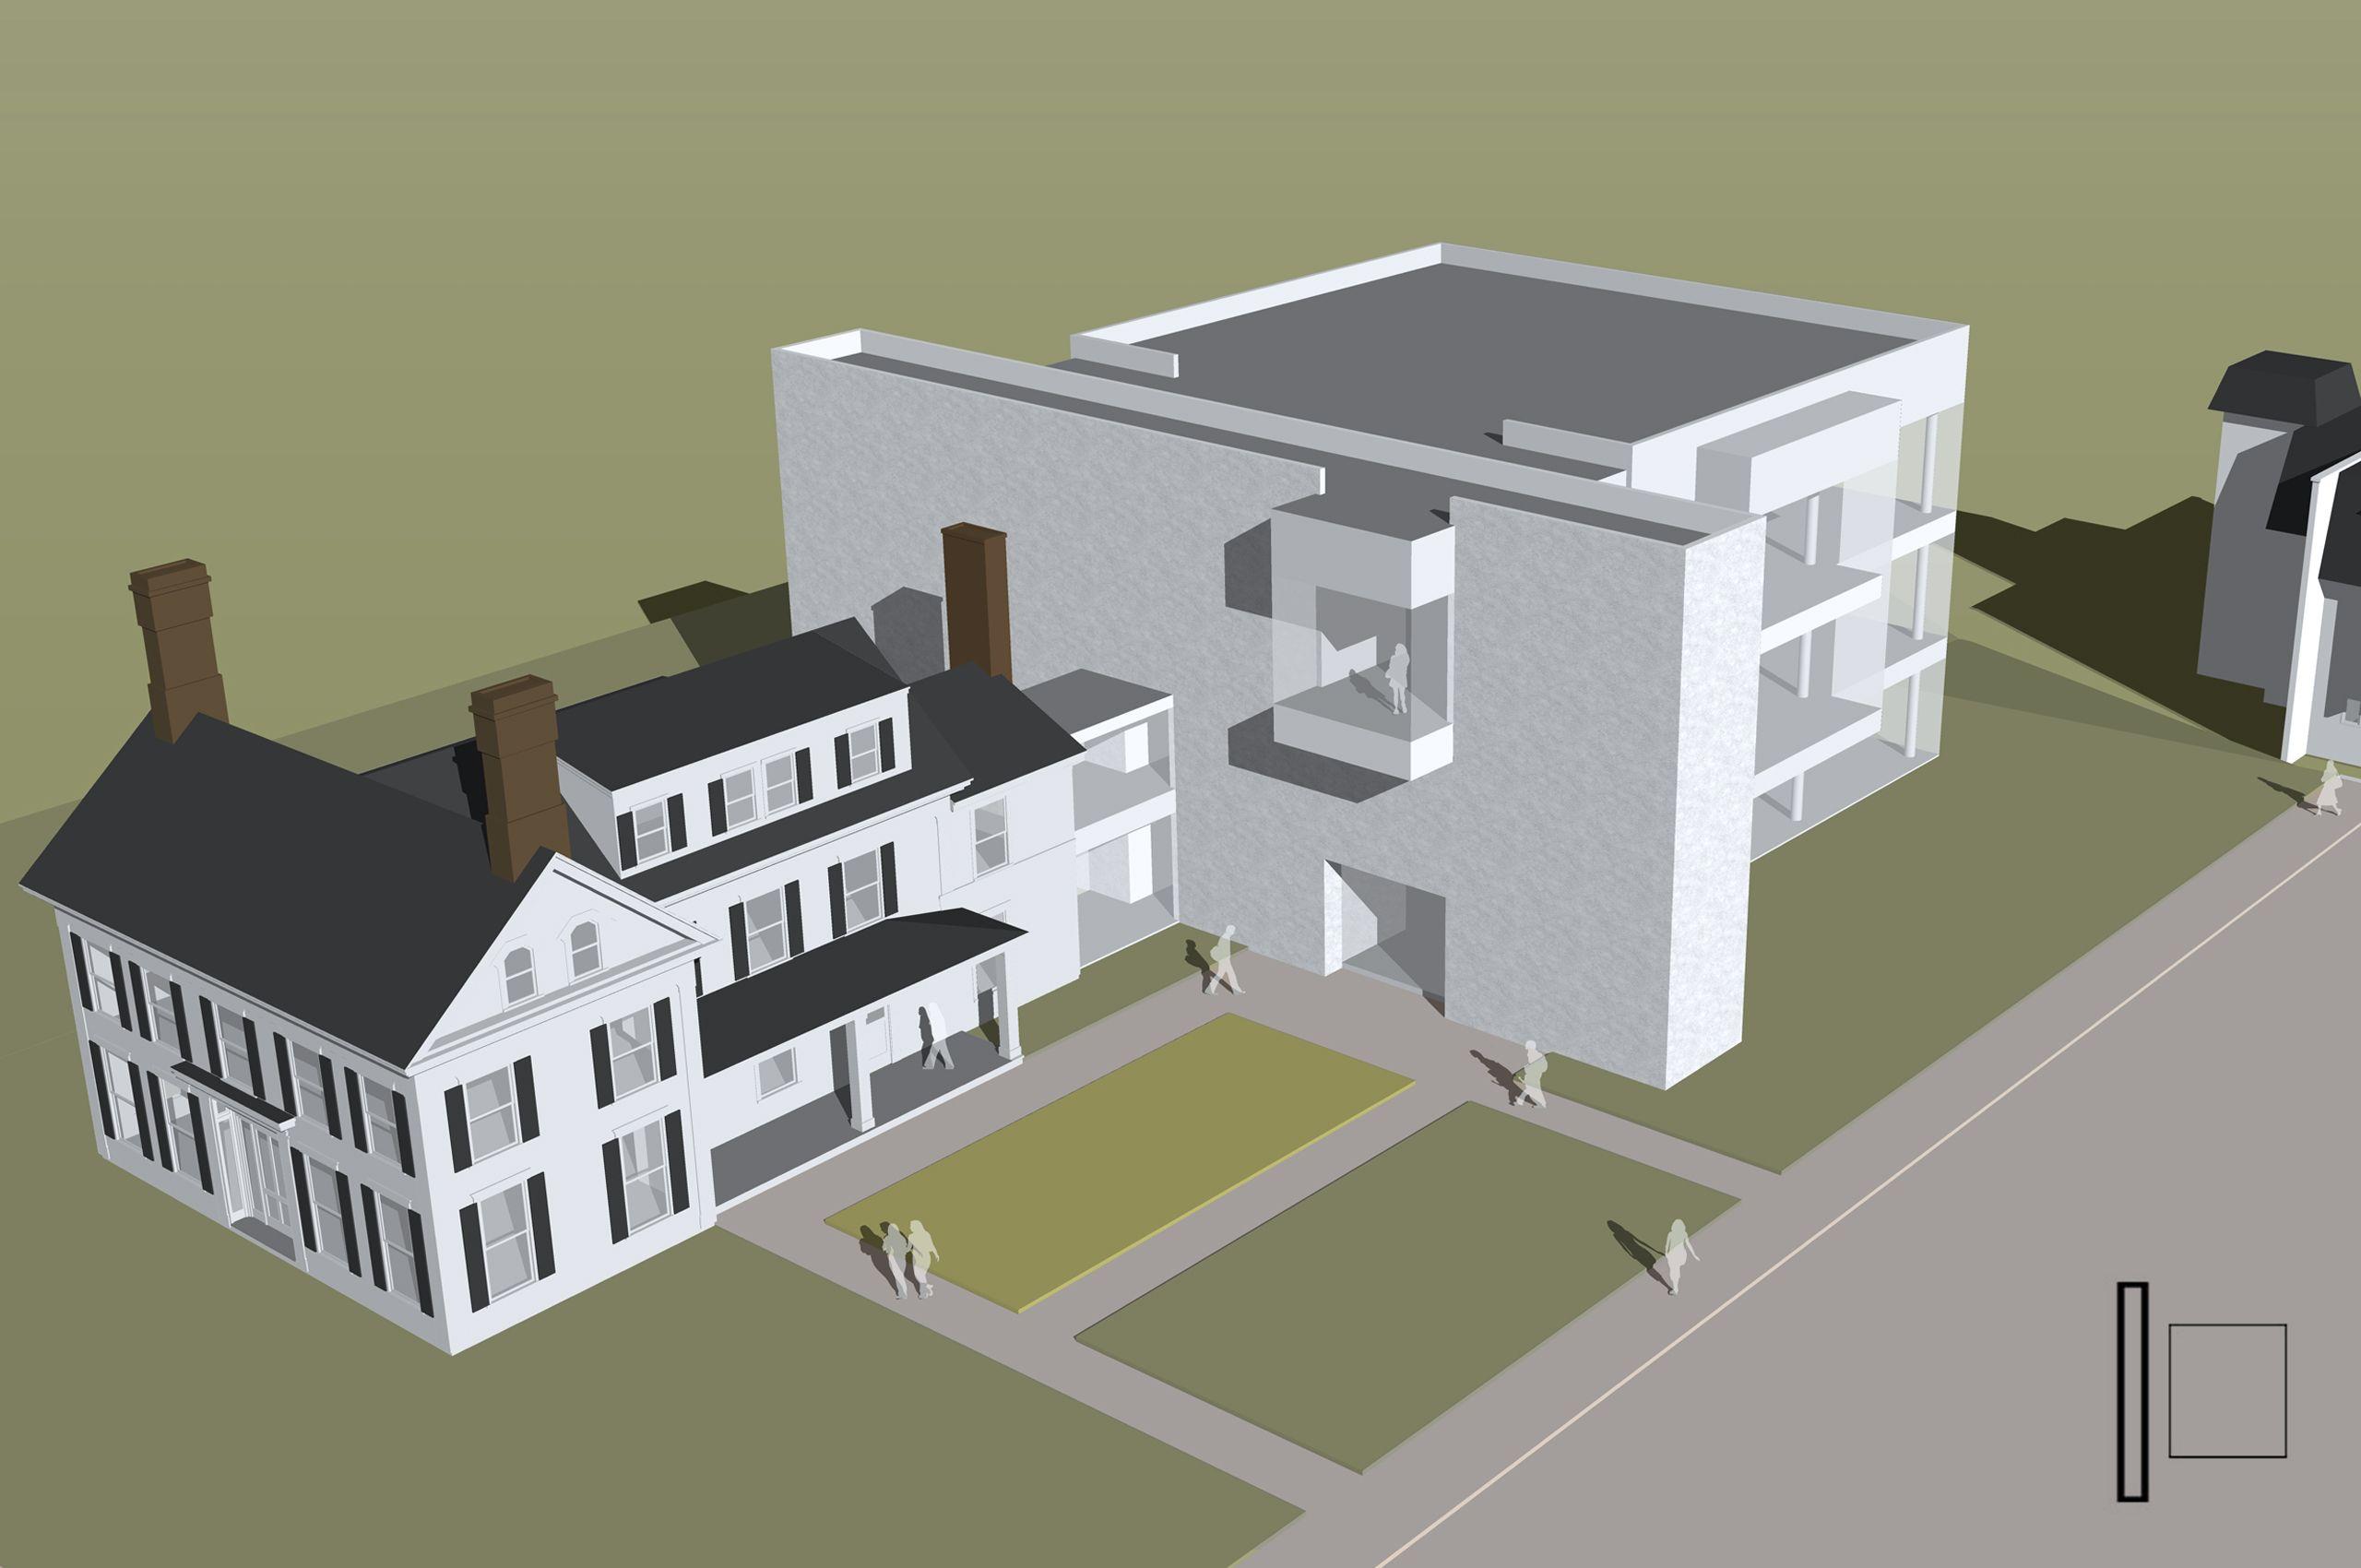 BowdoinCollege-Brunswick-ME-Scheme1-aerial-perspective.jpg